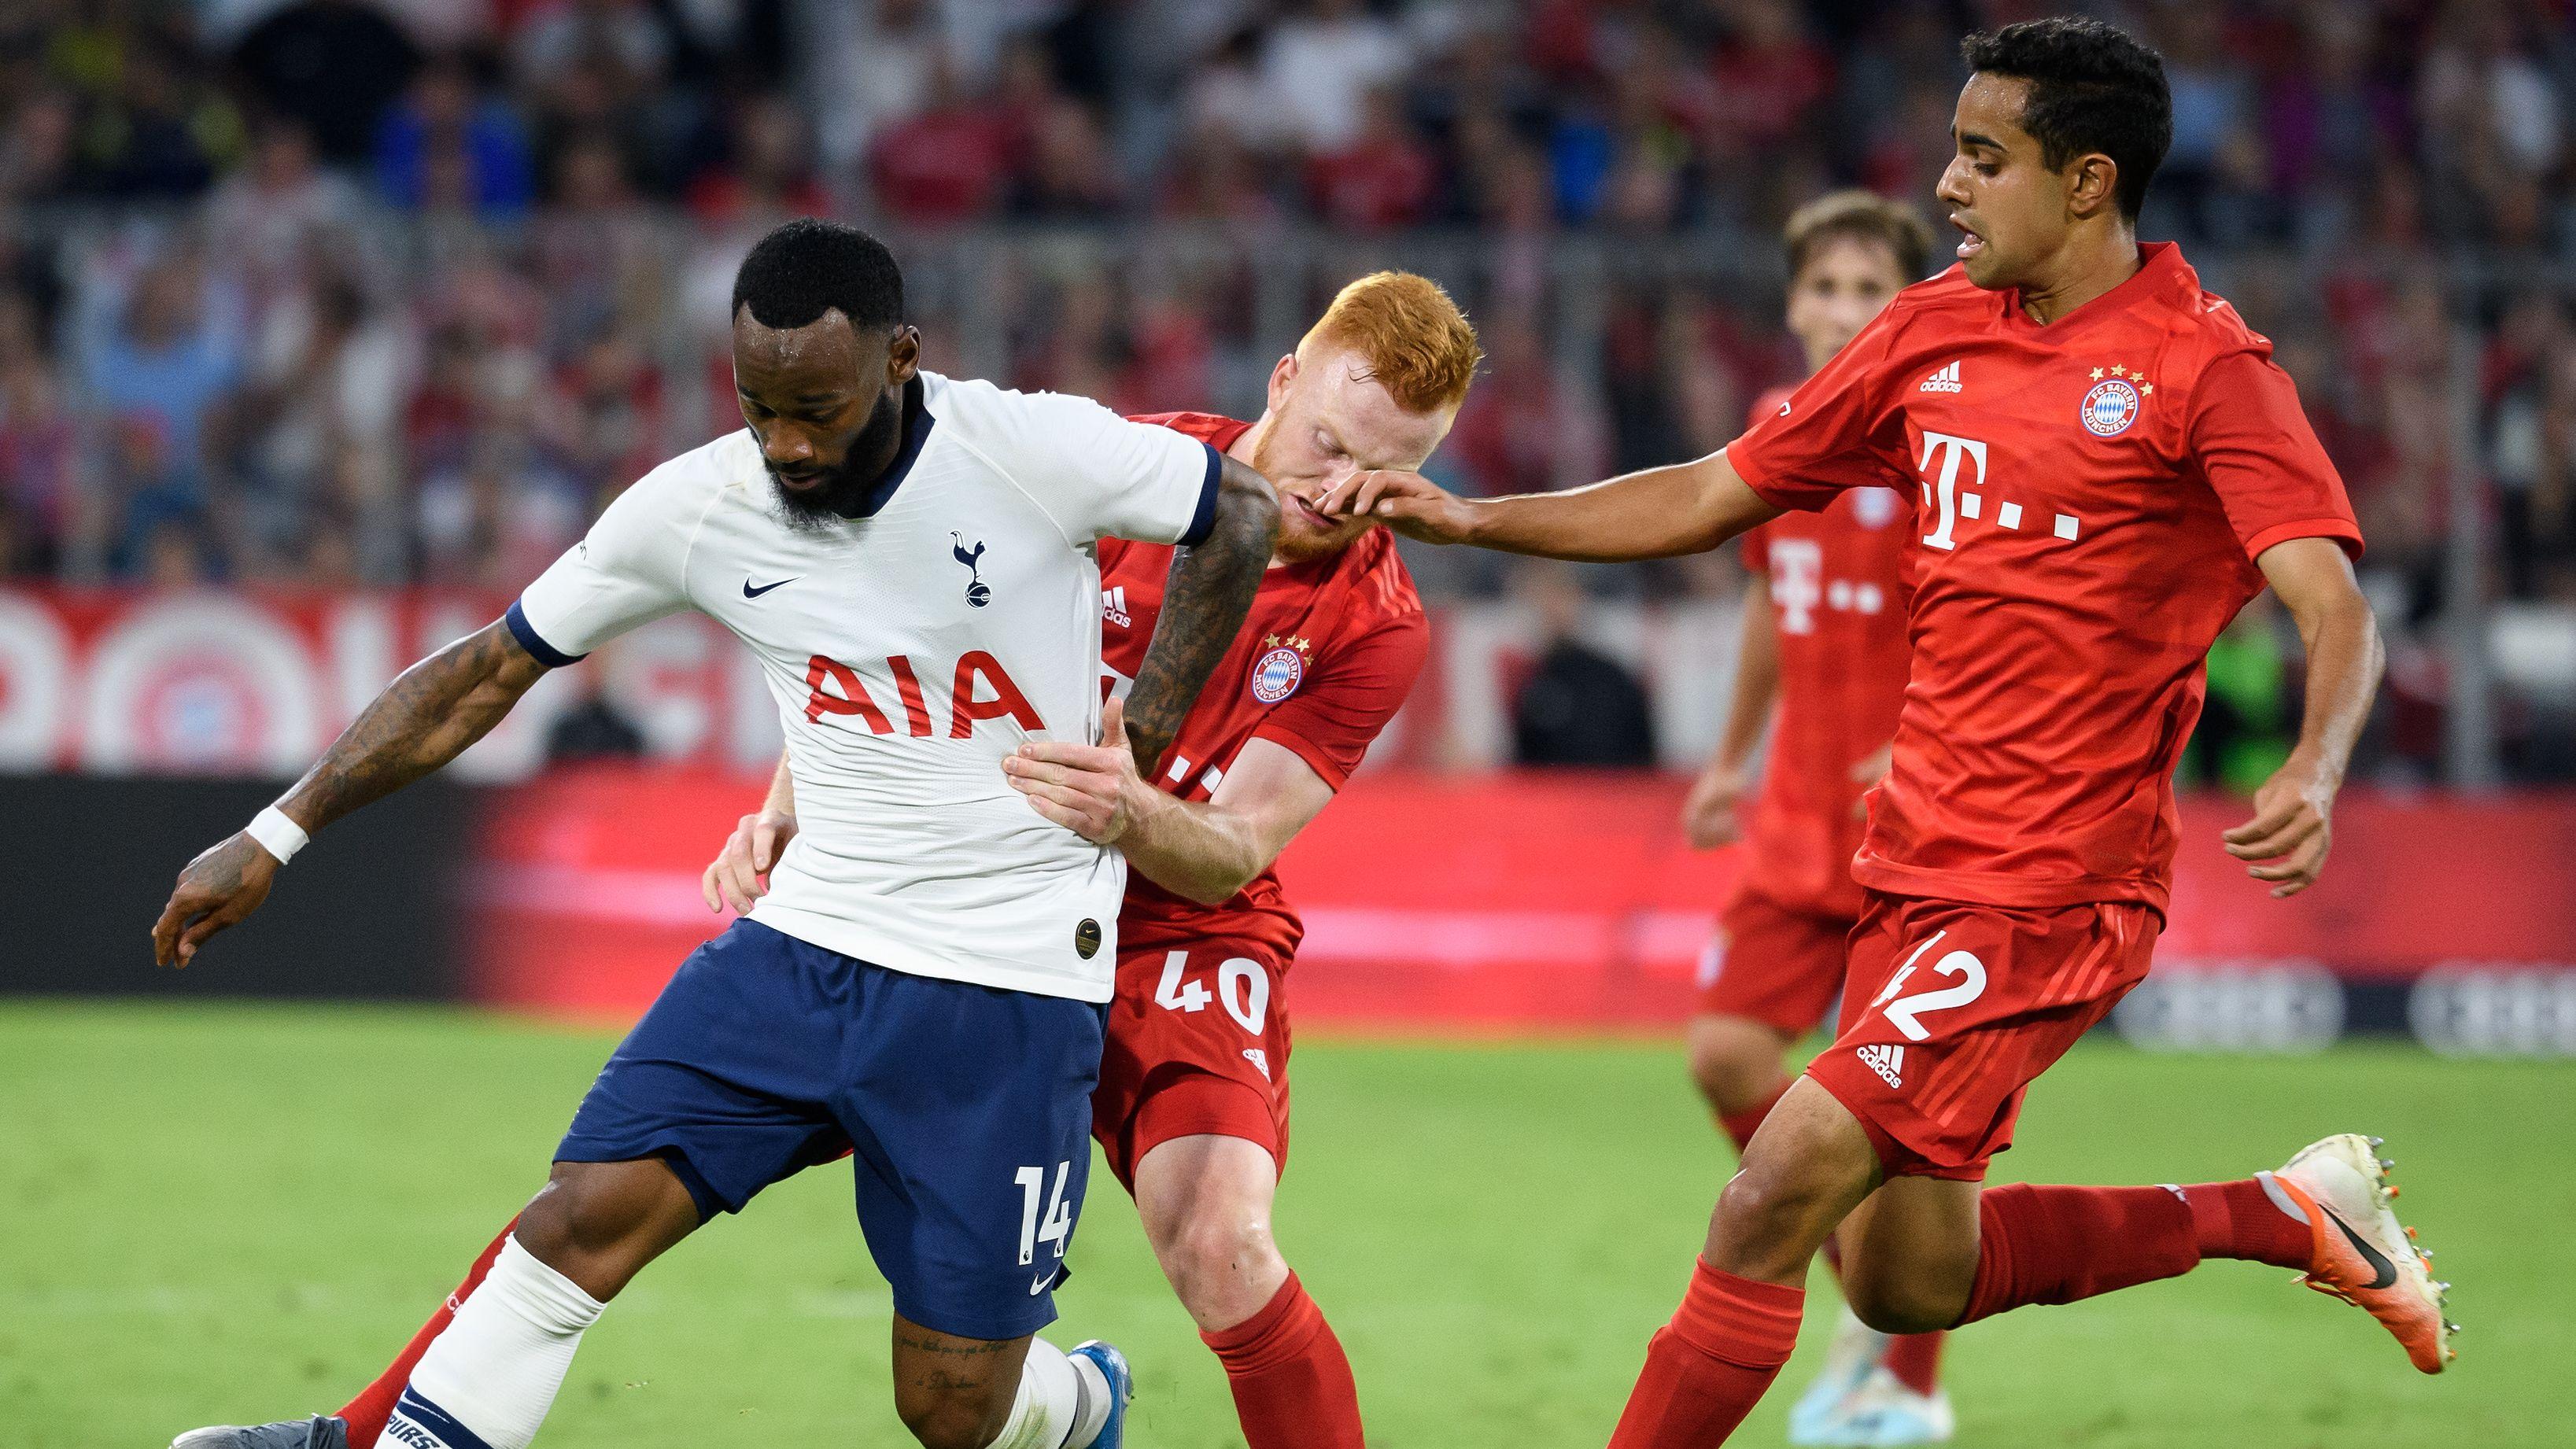 Spielszene FC Bayern München - Tottenham Hotspur